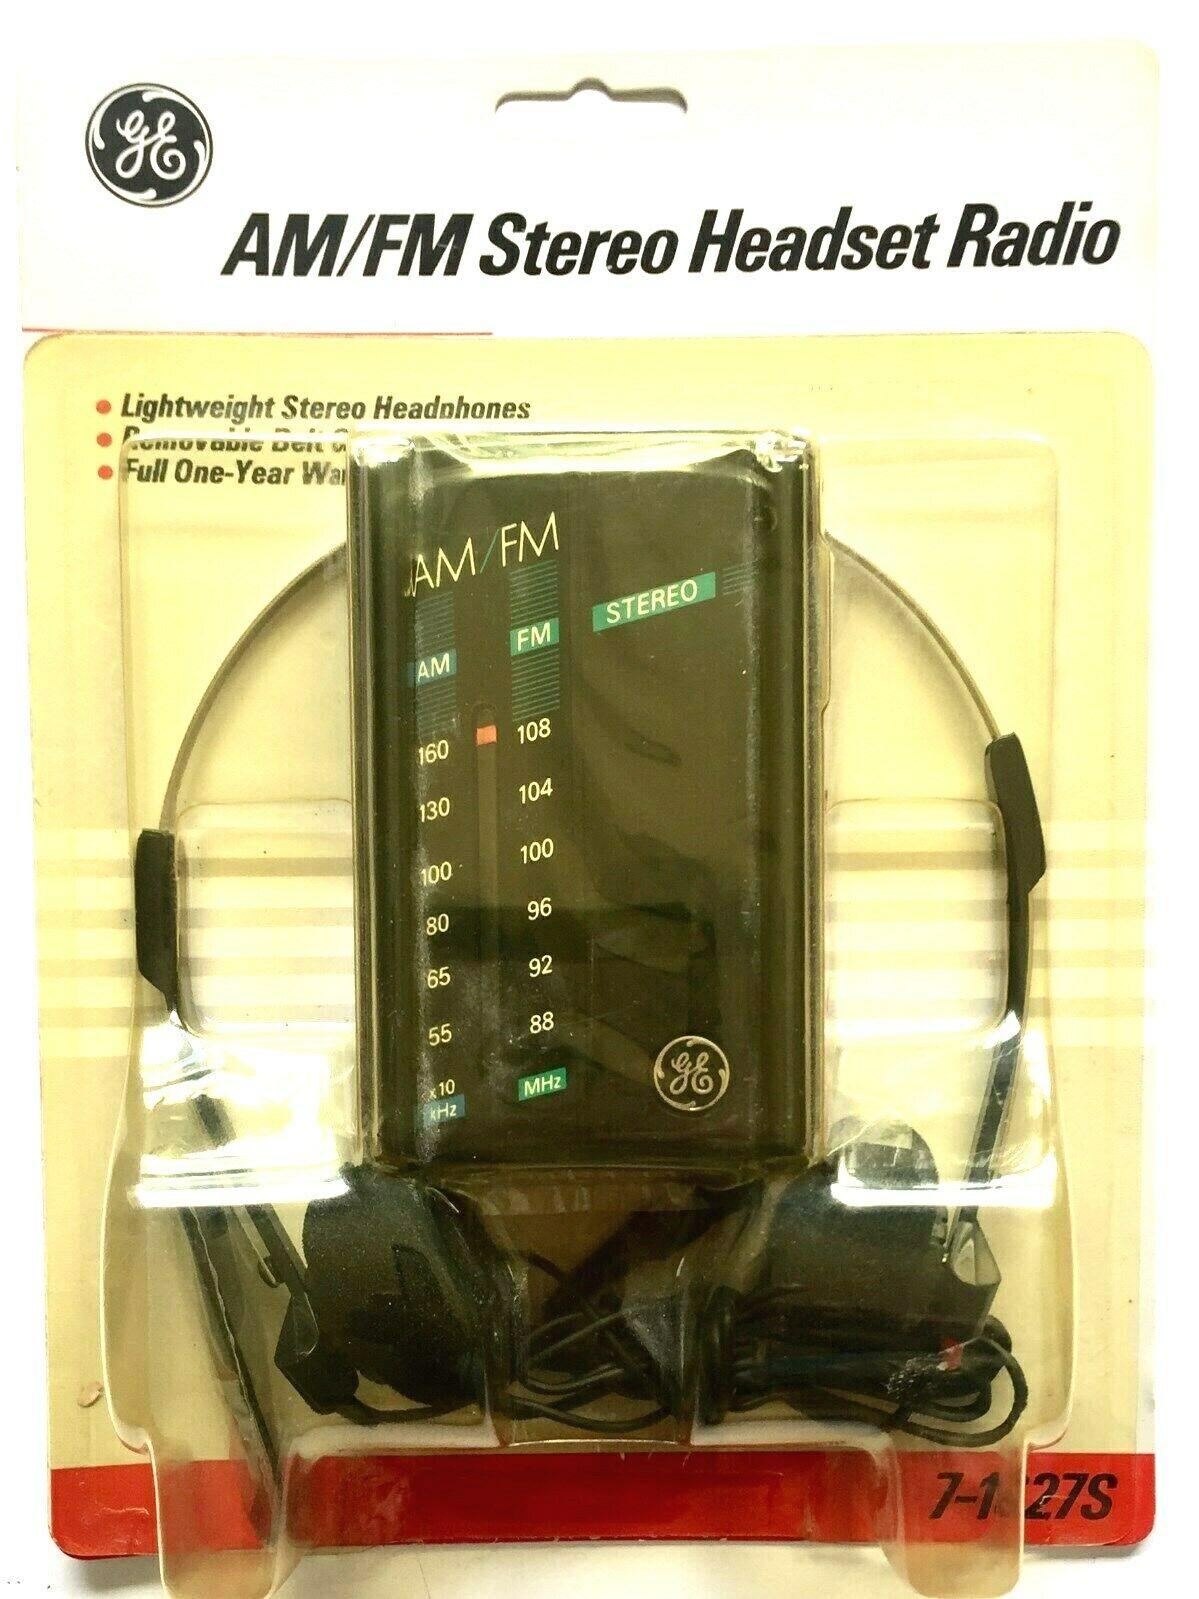 VINTAGE GE AM / FM STEREO HEADSET PORTABLE RADIO 7-1627S  NE